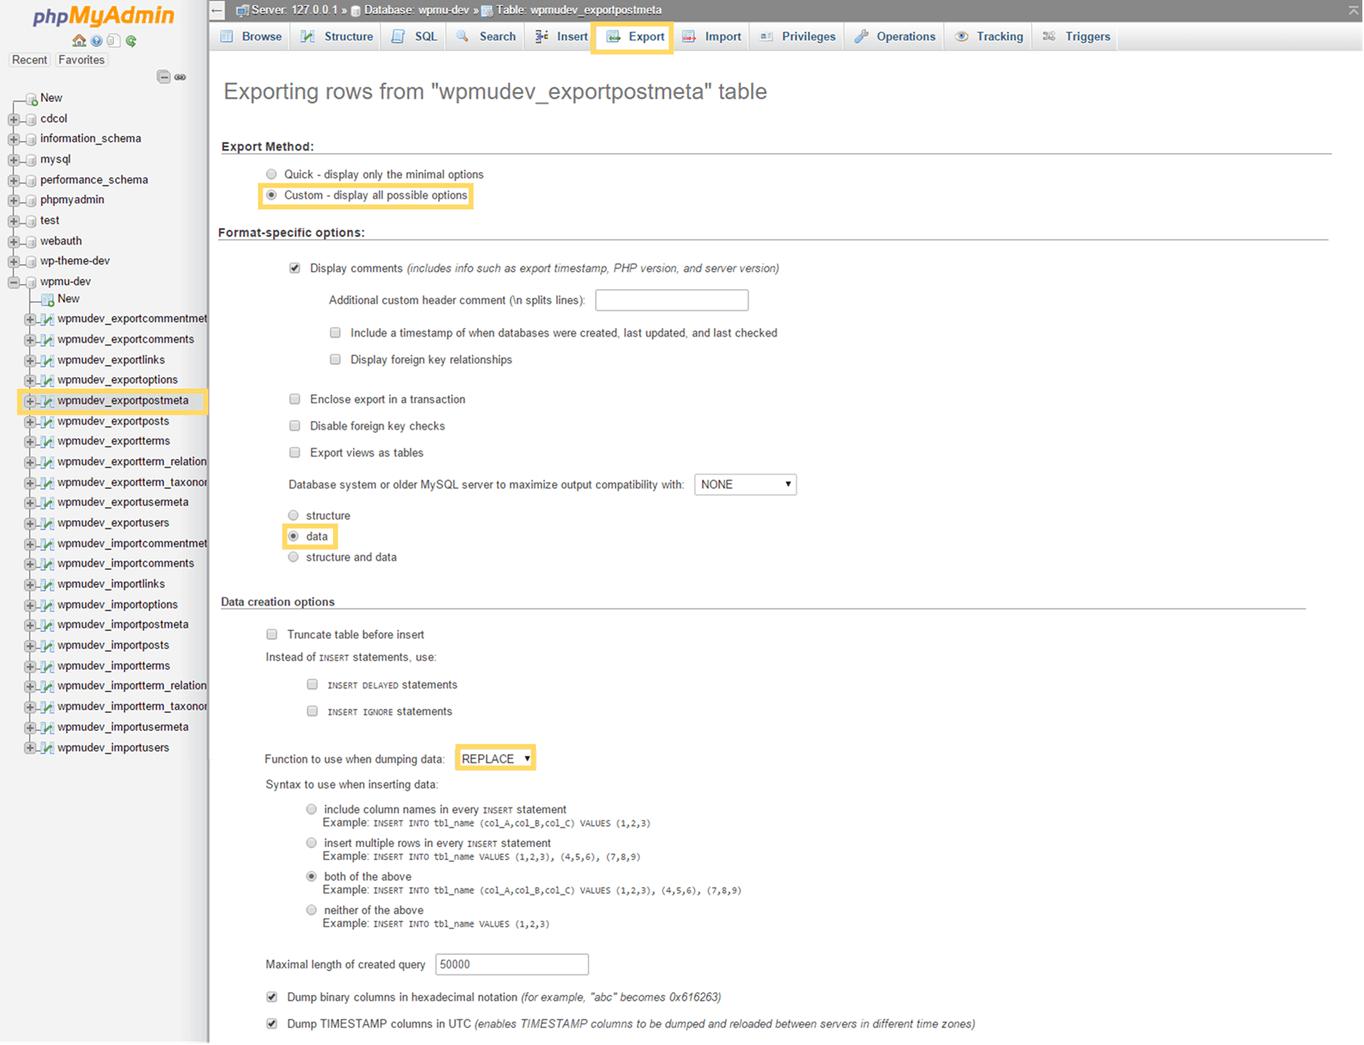 wp_postmeta Custom Export Options